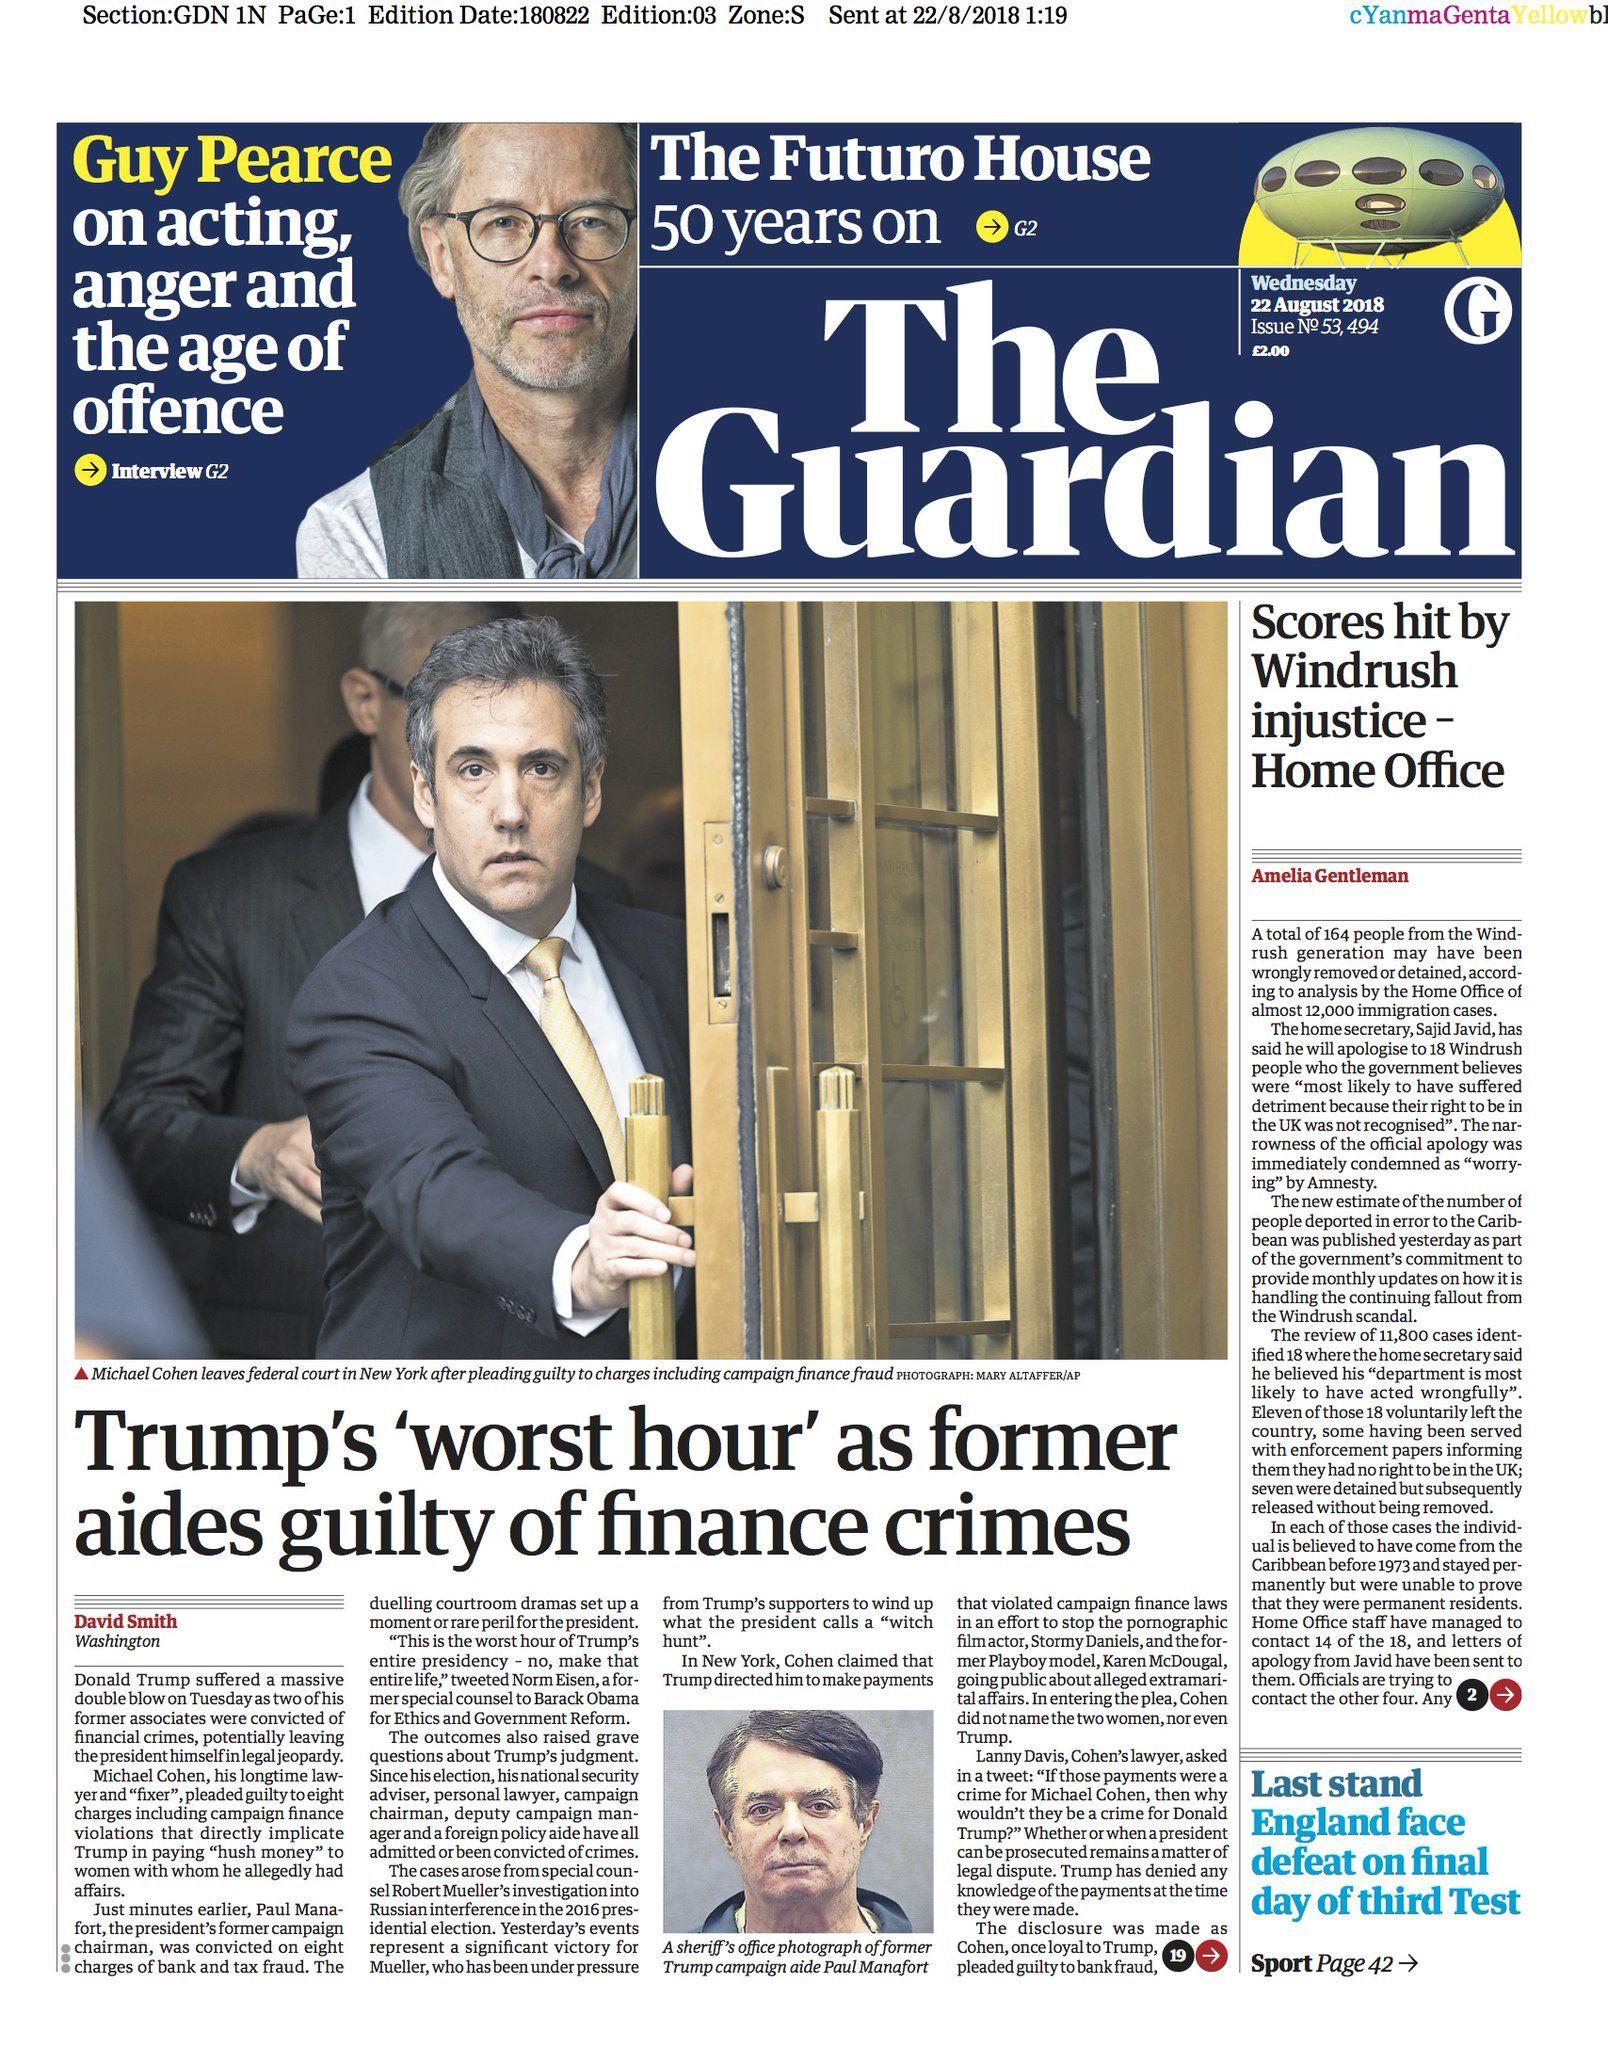 Go deeper: Newspapers react to Michael Cohen plea, Paul